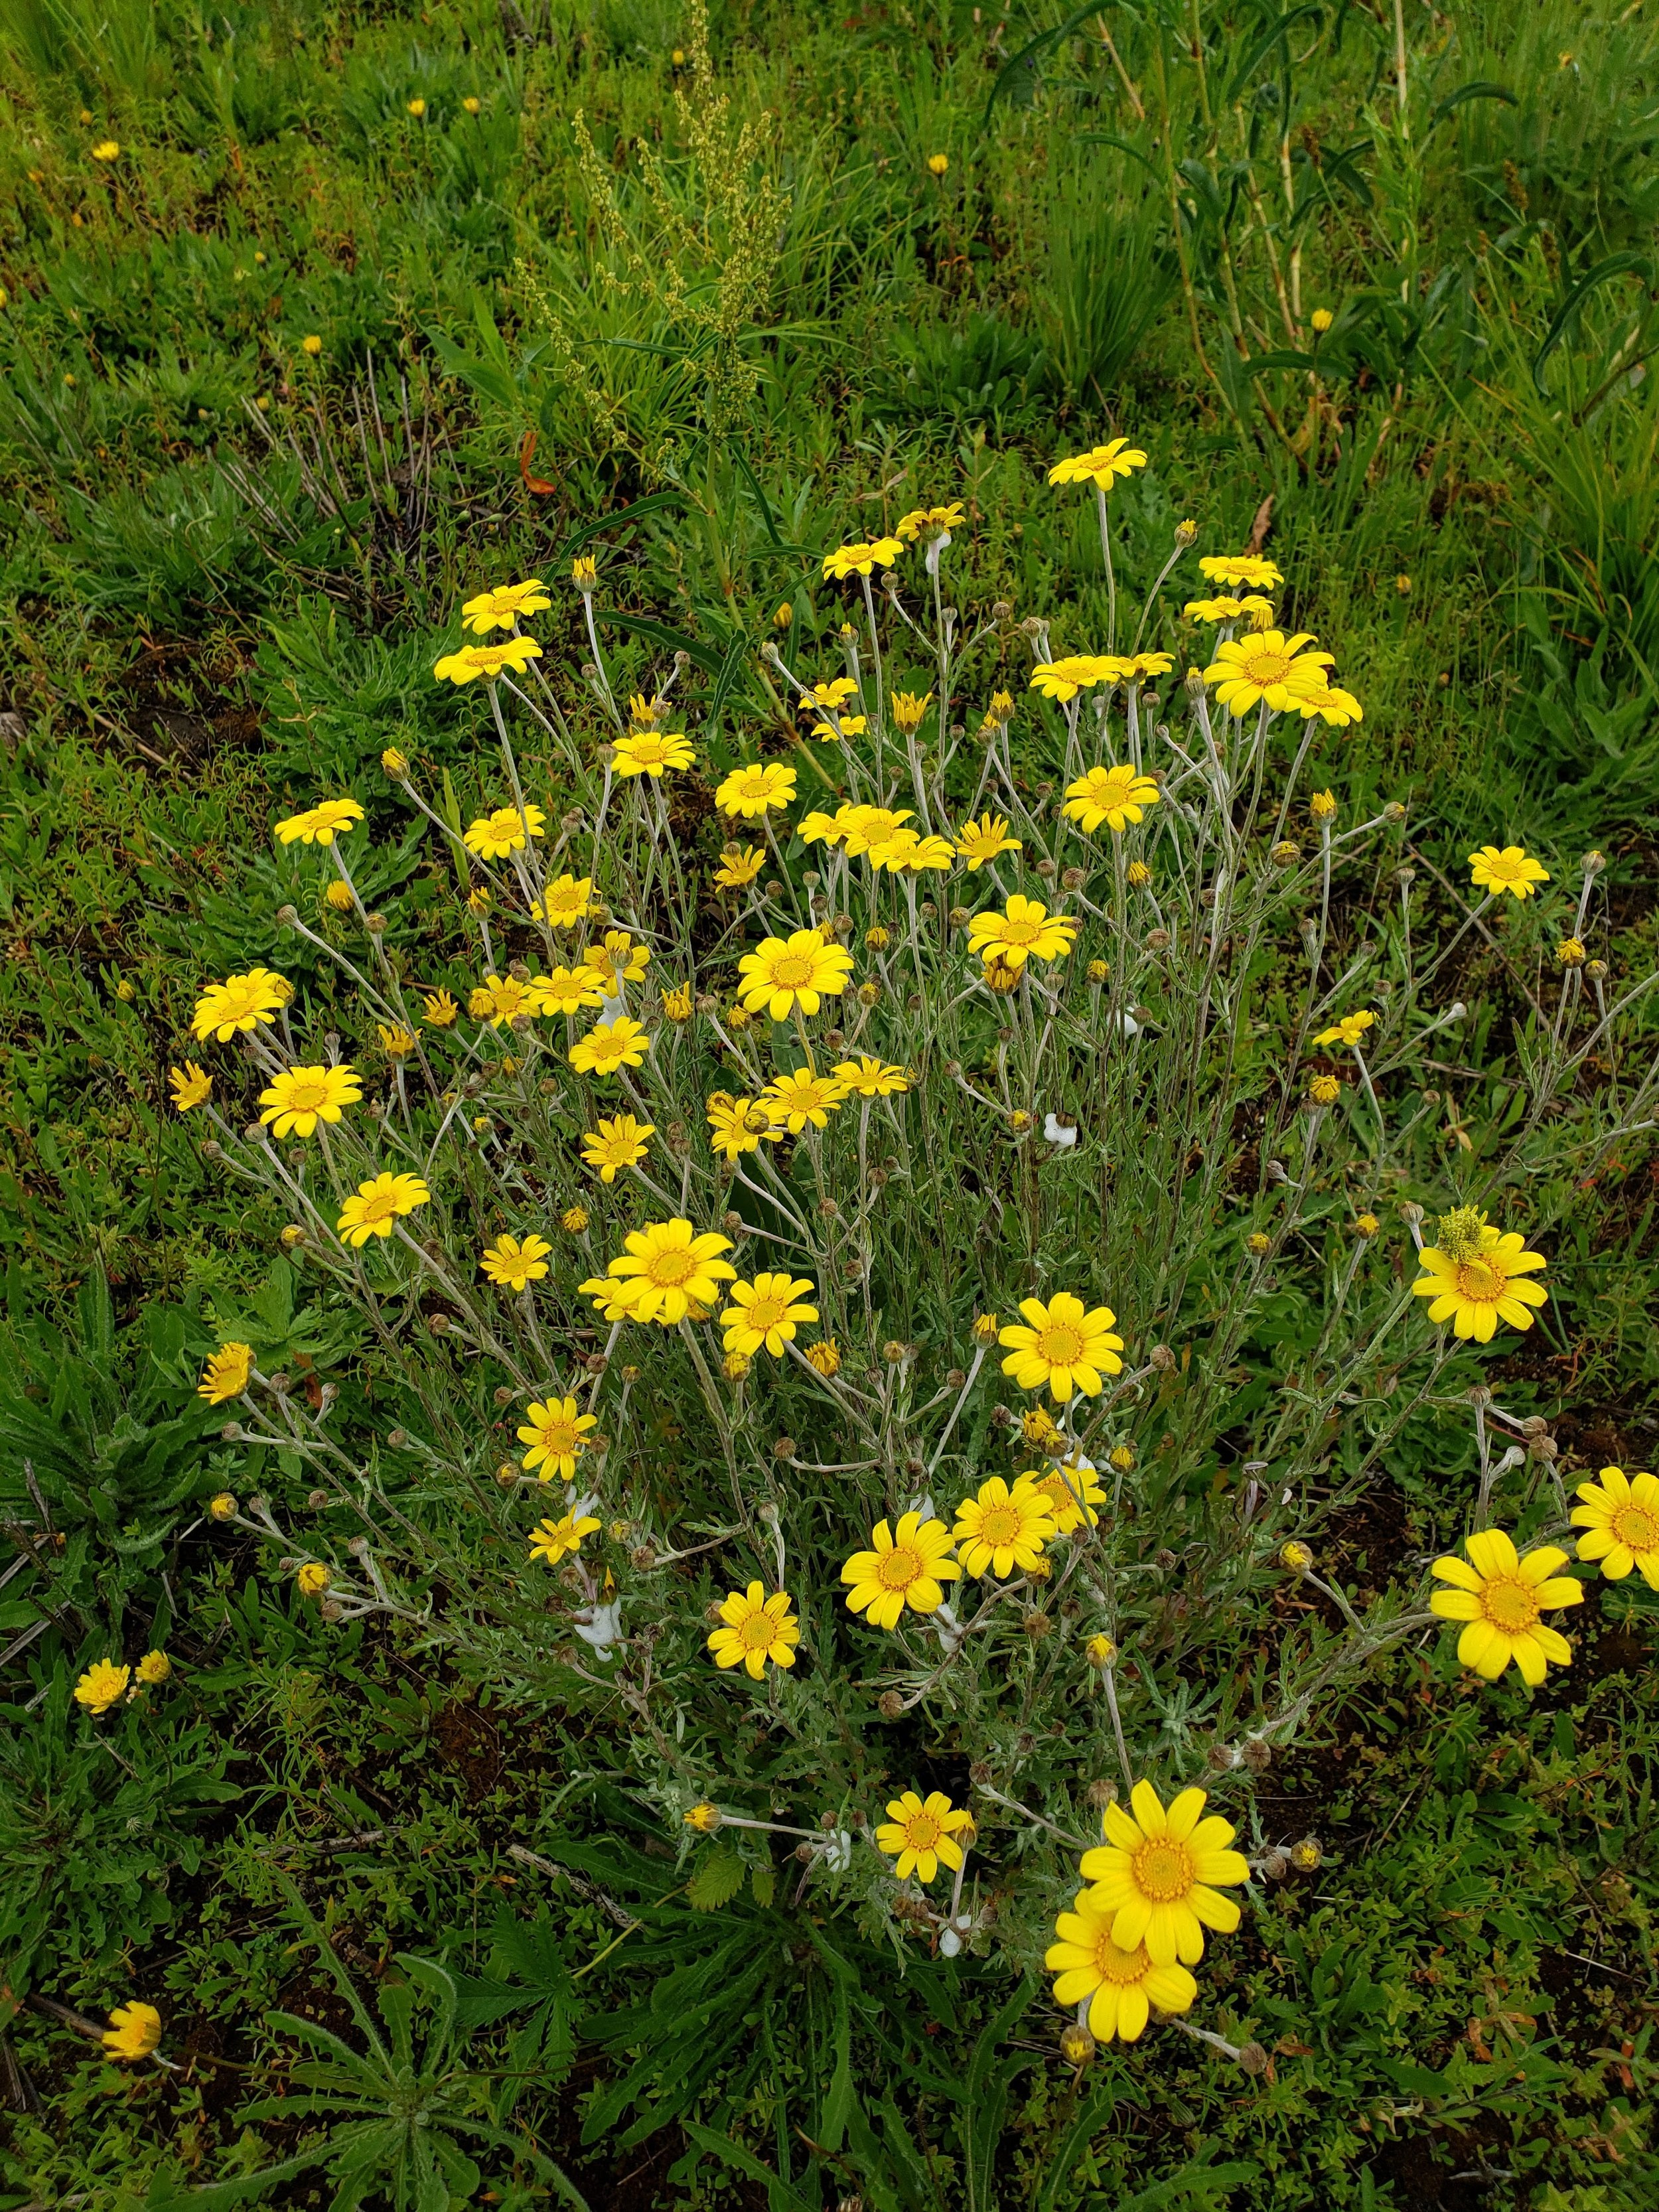 Oregon sunshine ( Eriophyllum lanatum )